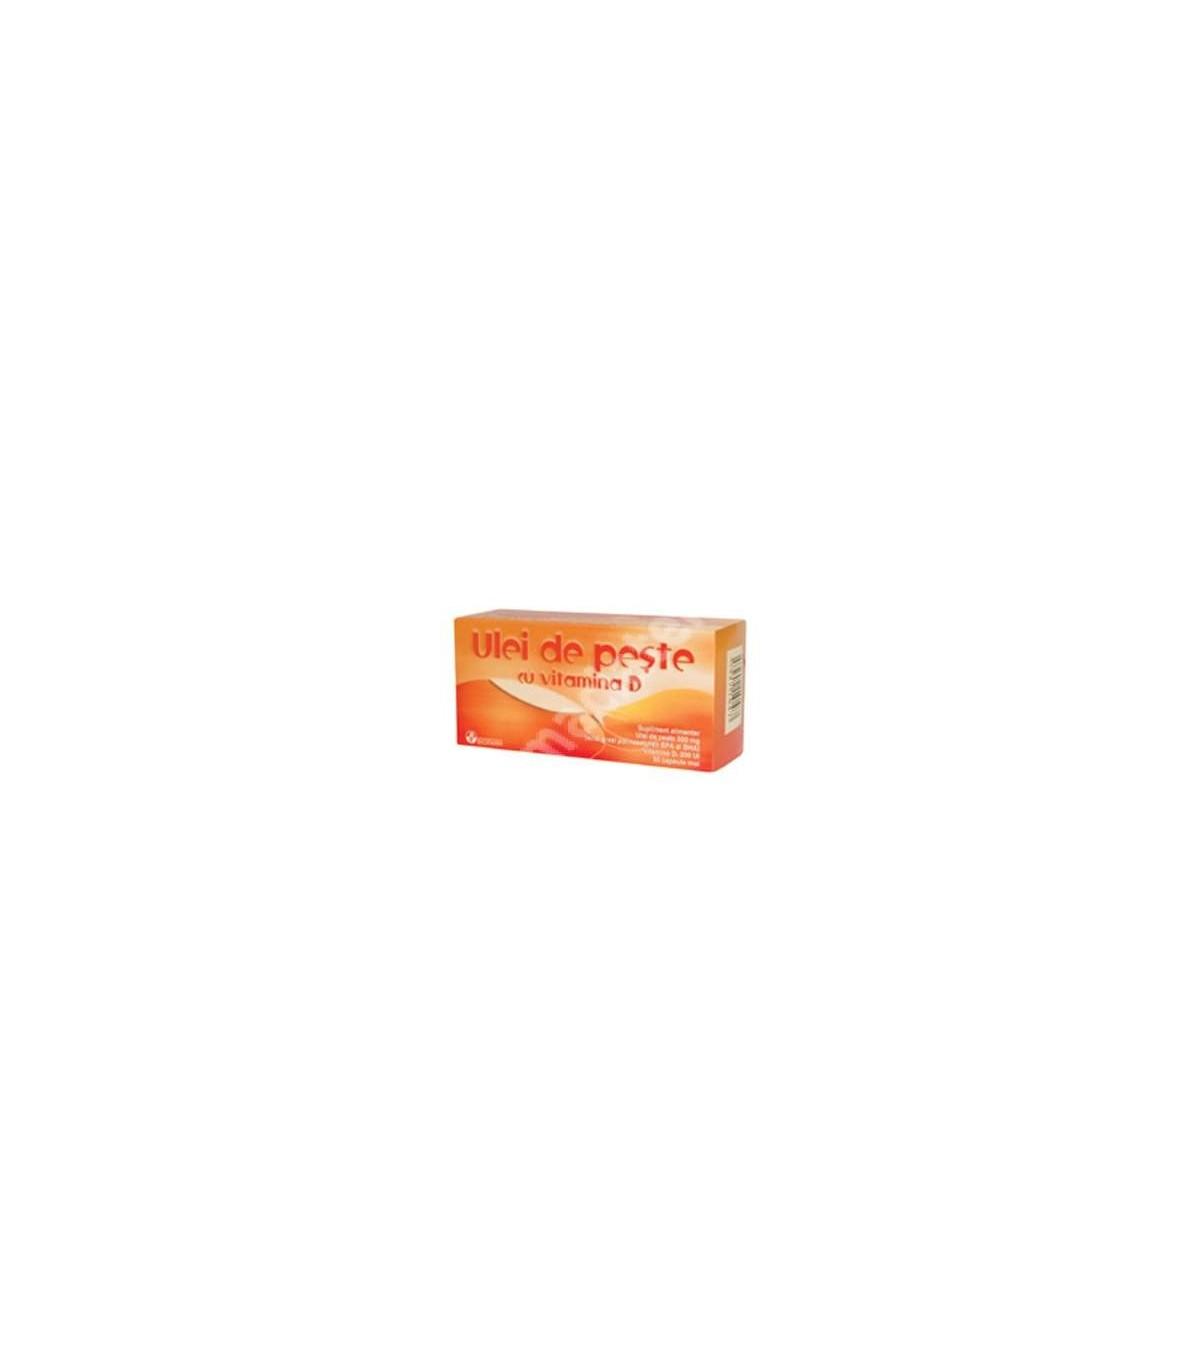 Ulei de peste cu vitamina D Bioland, 30 capsule moi, Biofar : Farmacia Tei online